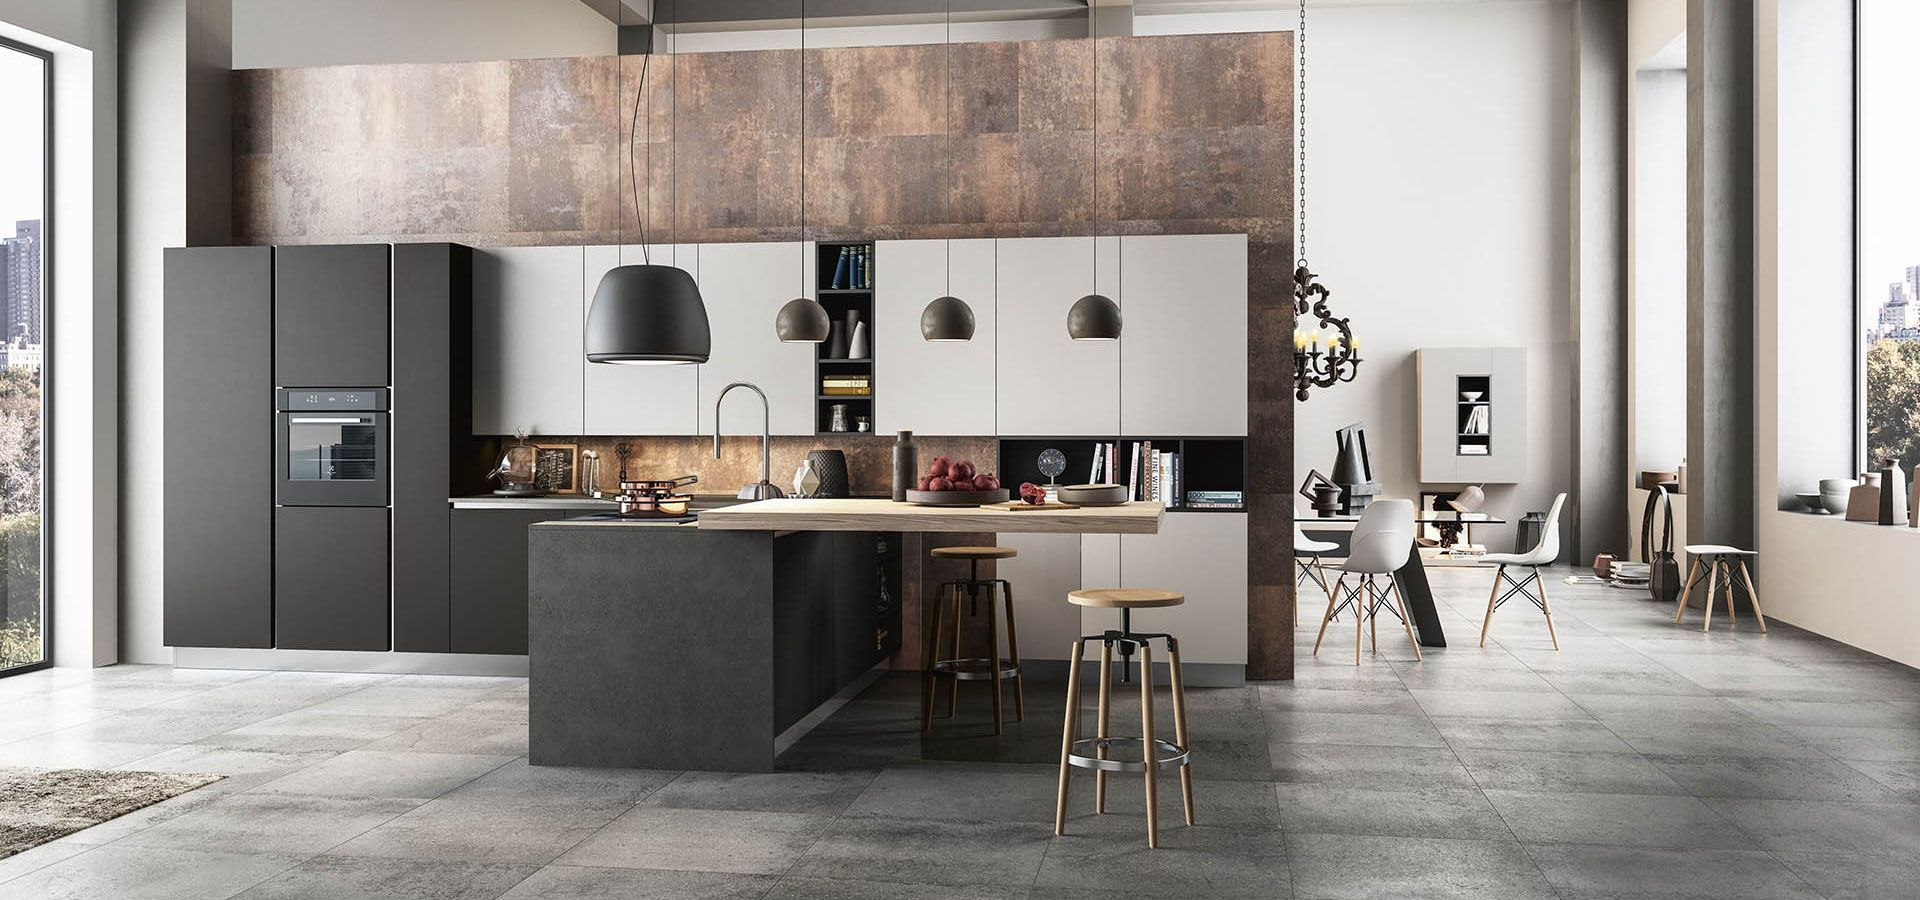 Cucina moderna time finiture nero opaco nebbia opaco top laminato porfido nero piano - Piano snack cucina ...